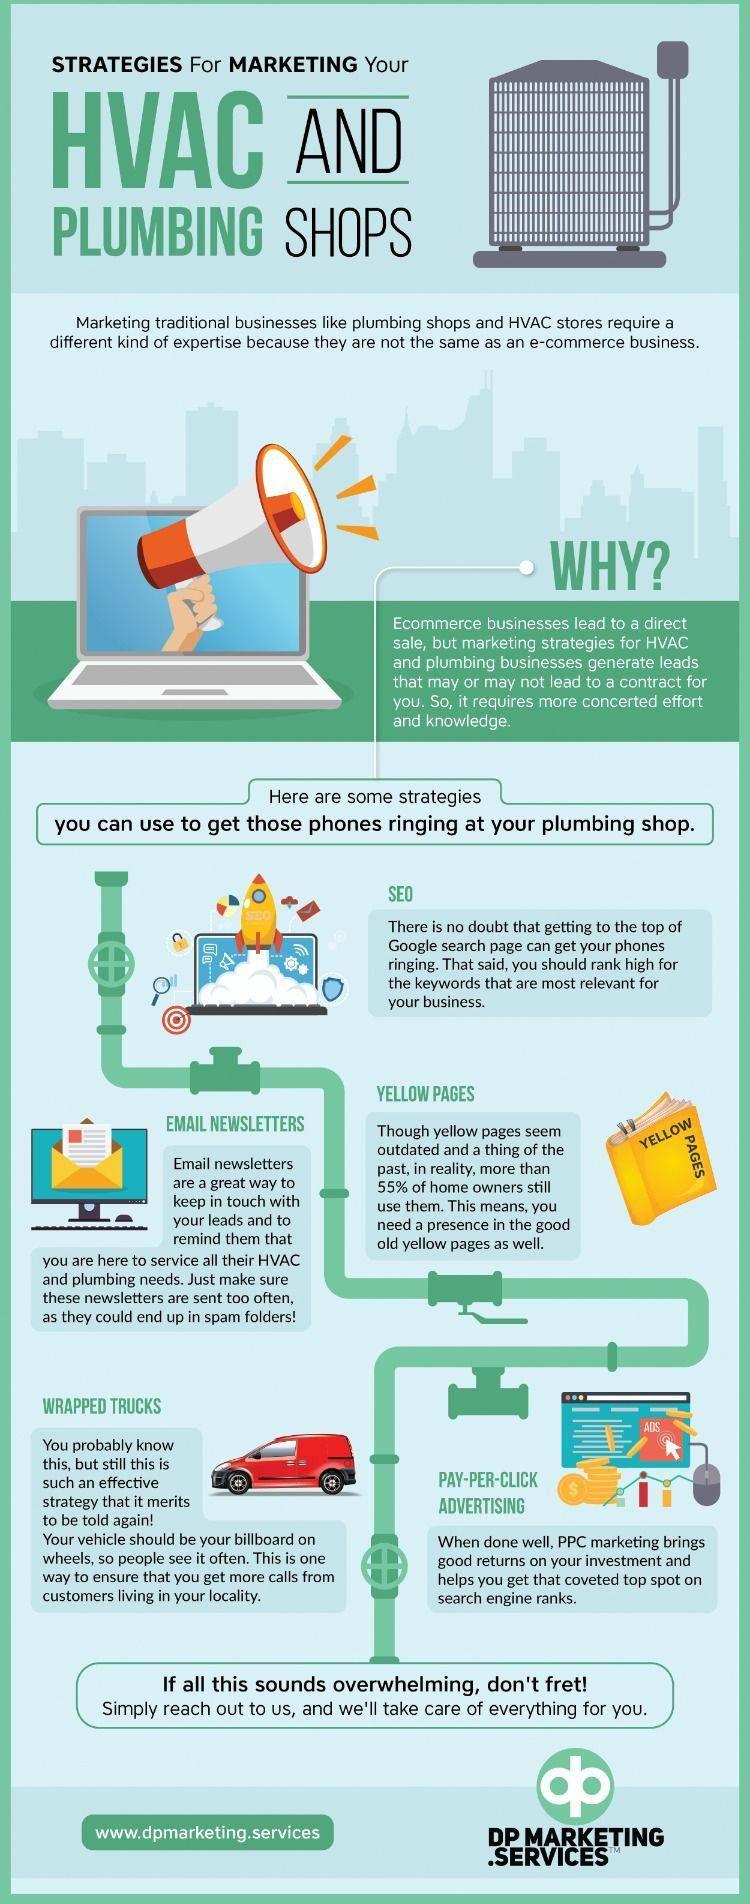 plumbing exam preparation guide, standard plumbing supply